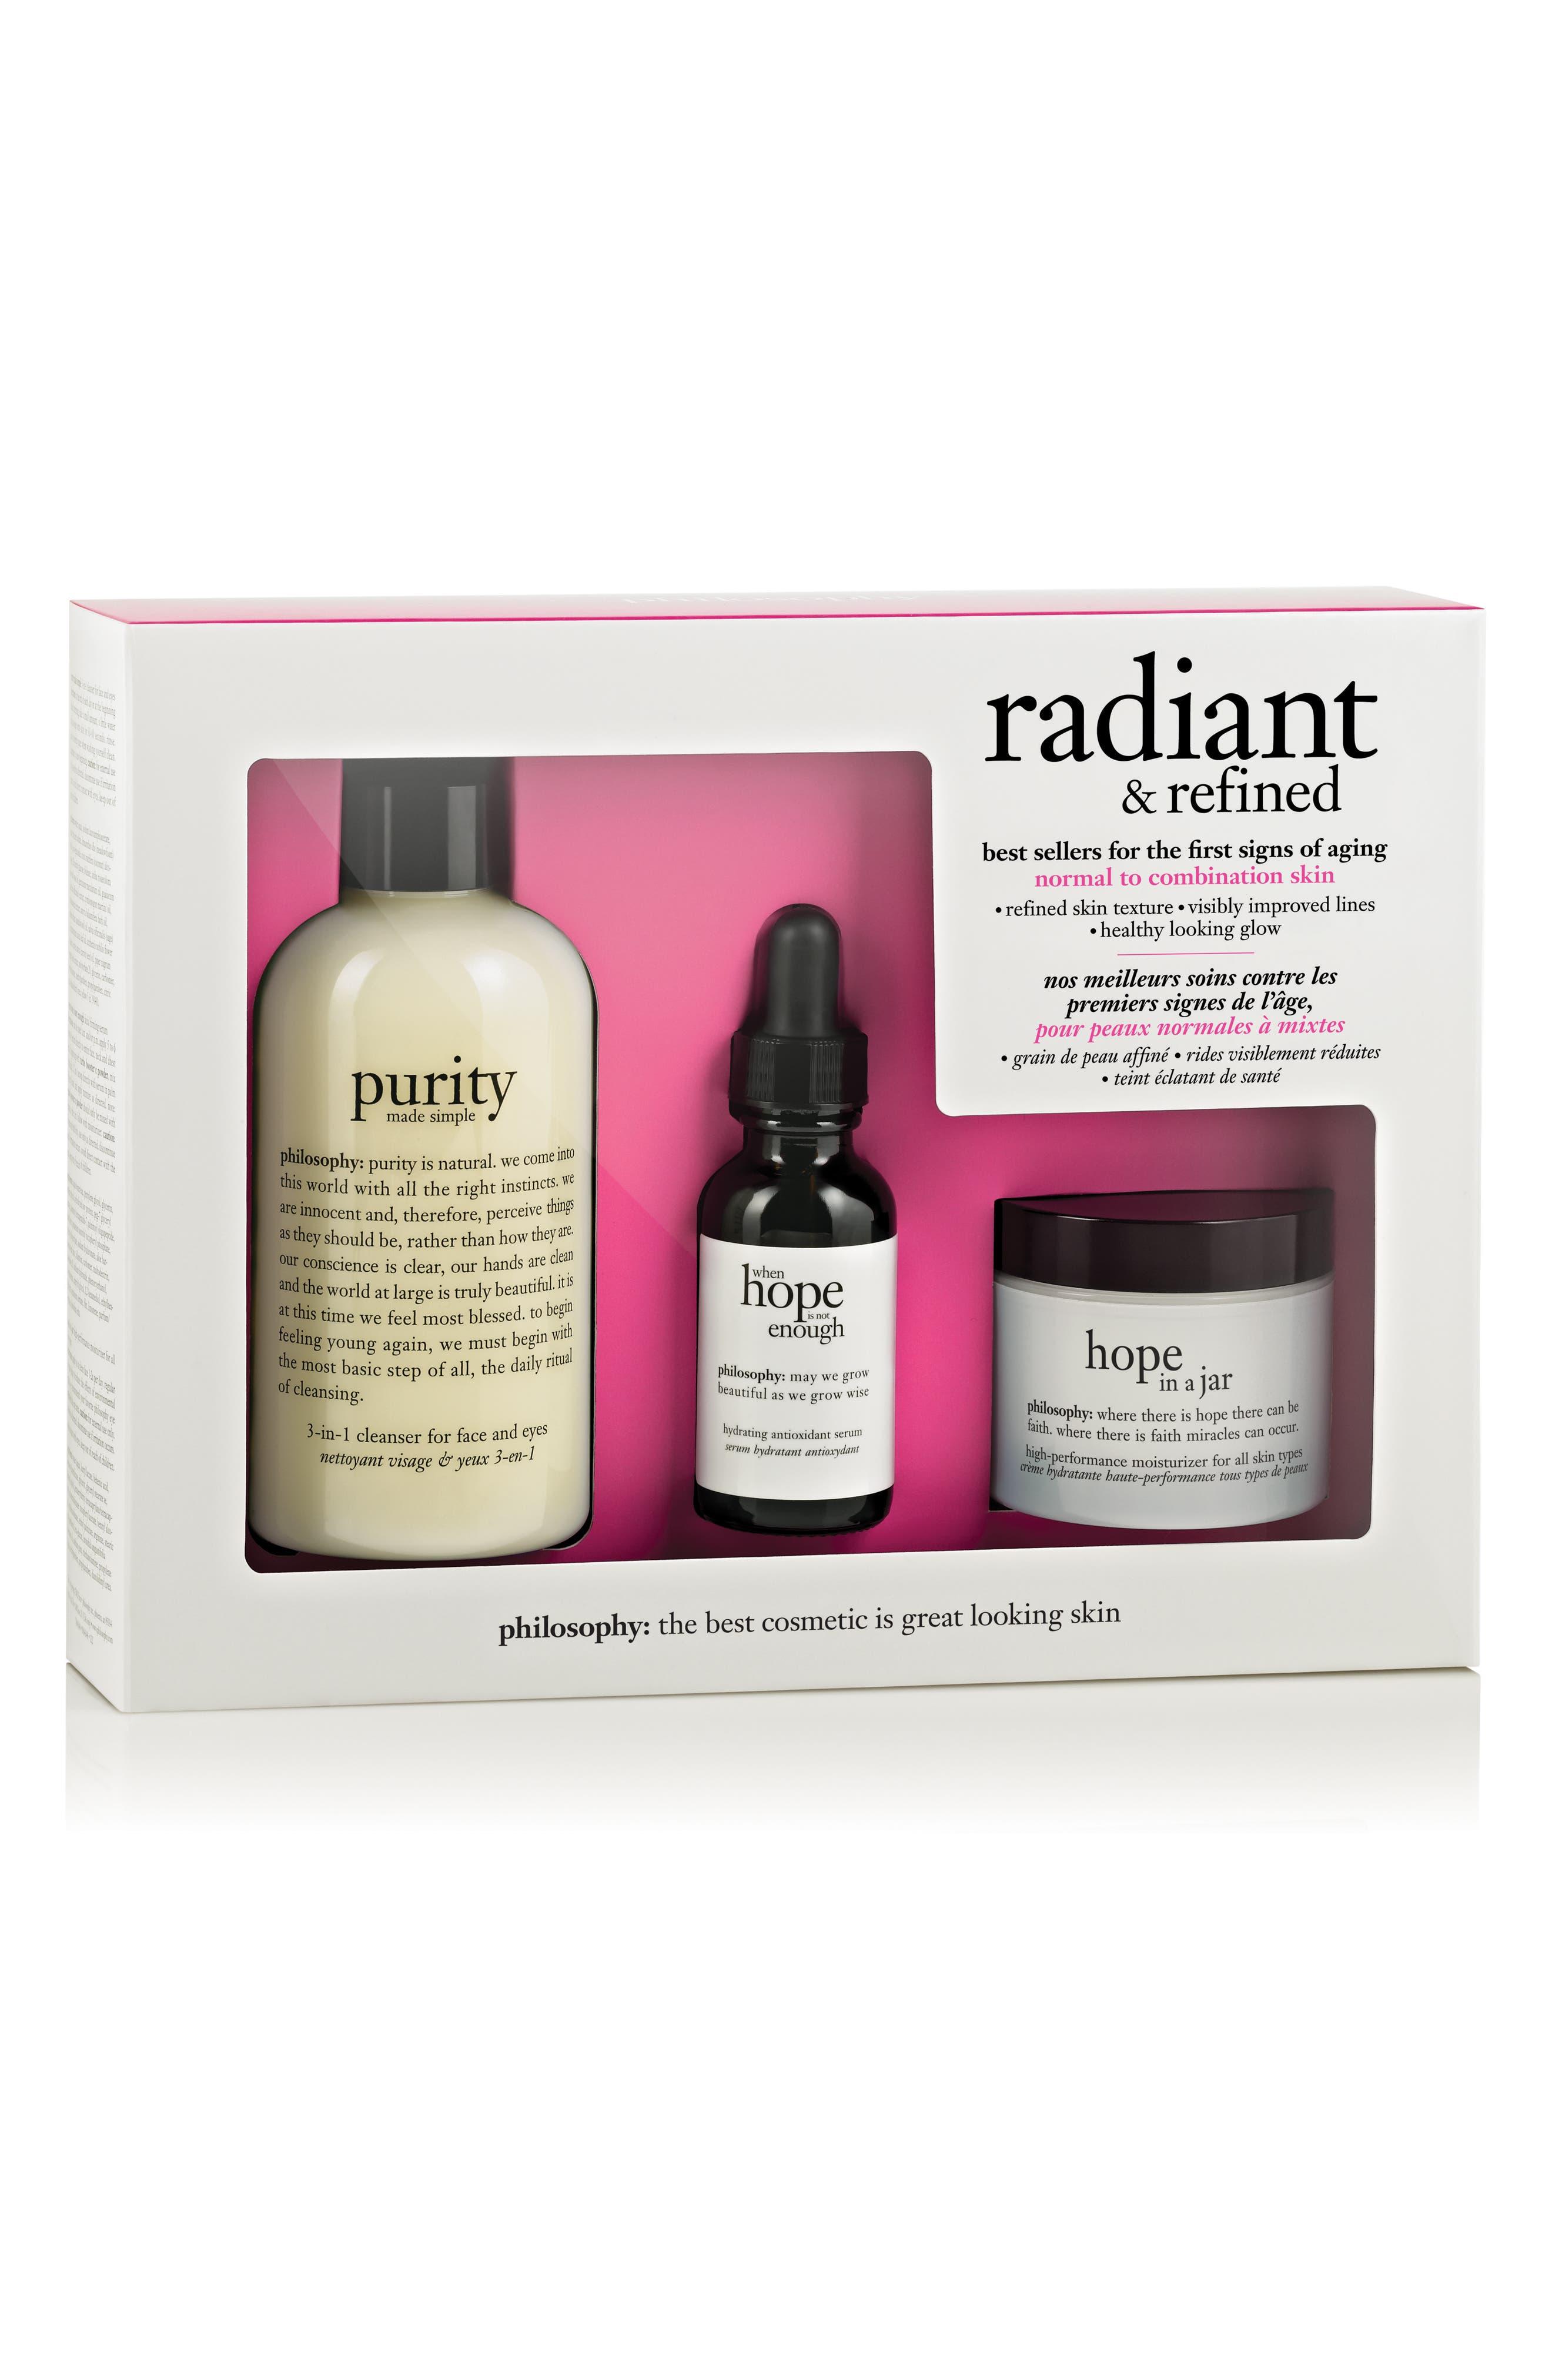 philosophy 'radiant & refined' skincare set ($102 Value)